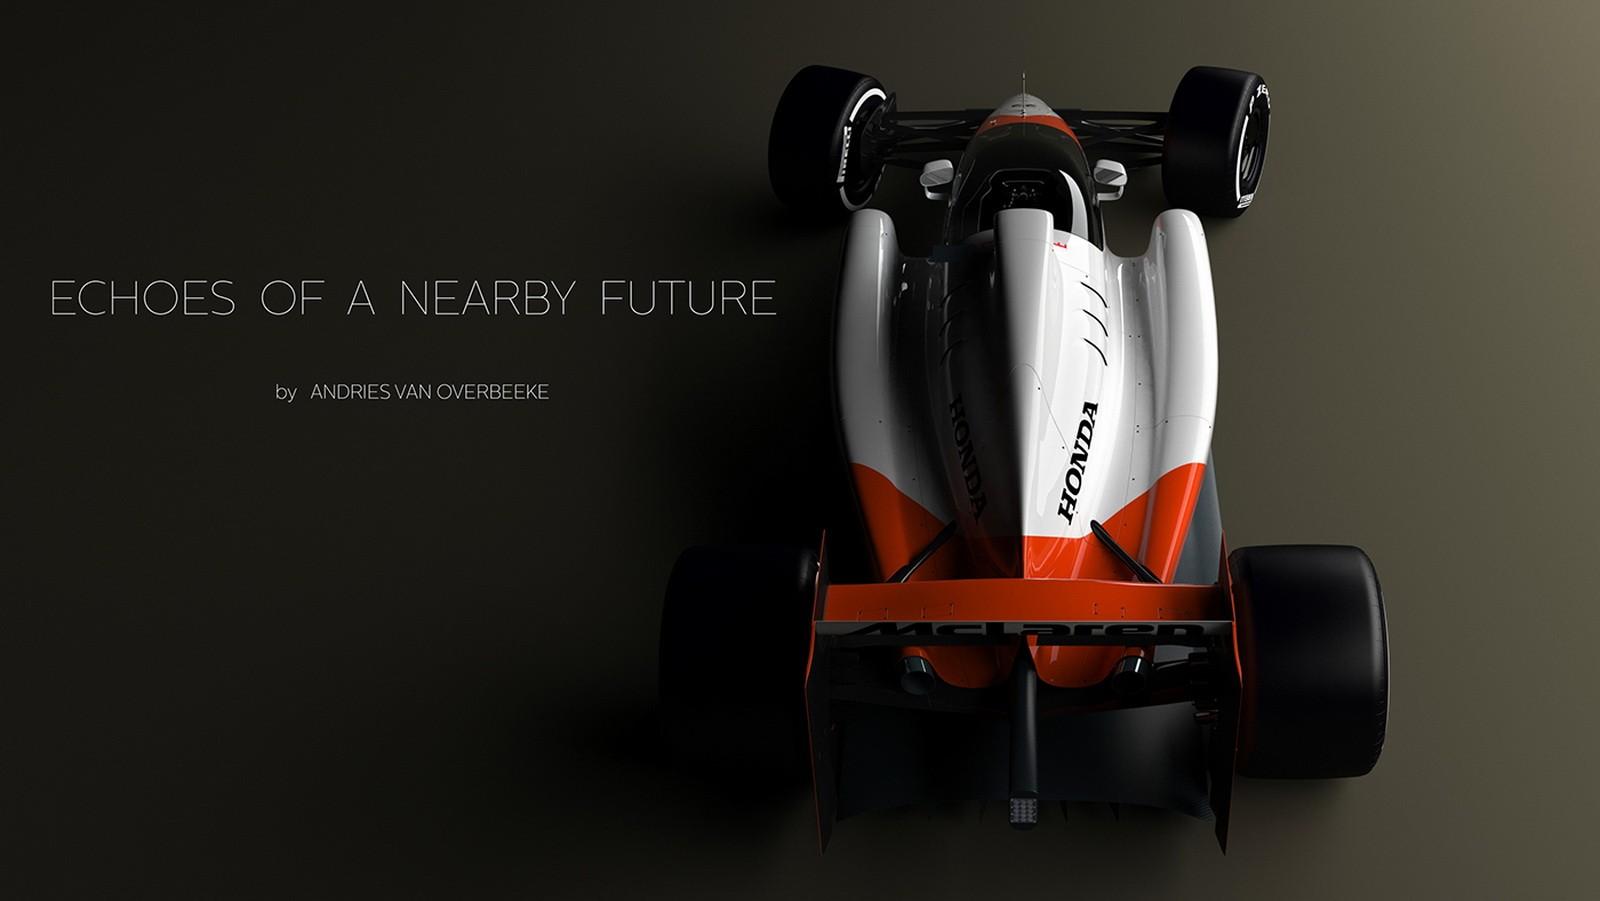 future-formula-1-concept-earns-closed-cockpit-honda-mclaren-livery-photo-gallery_9